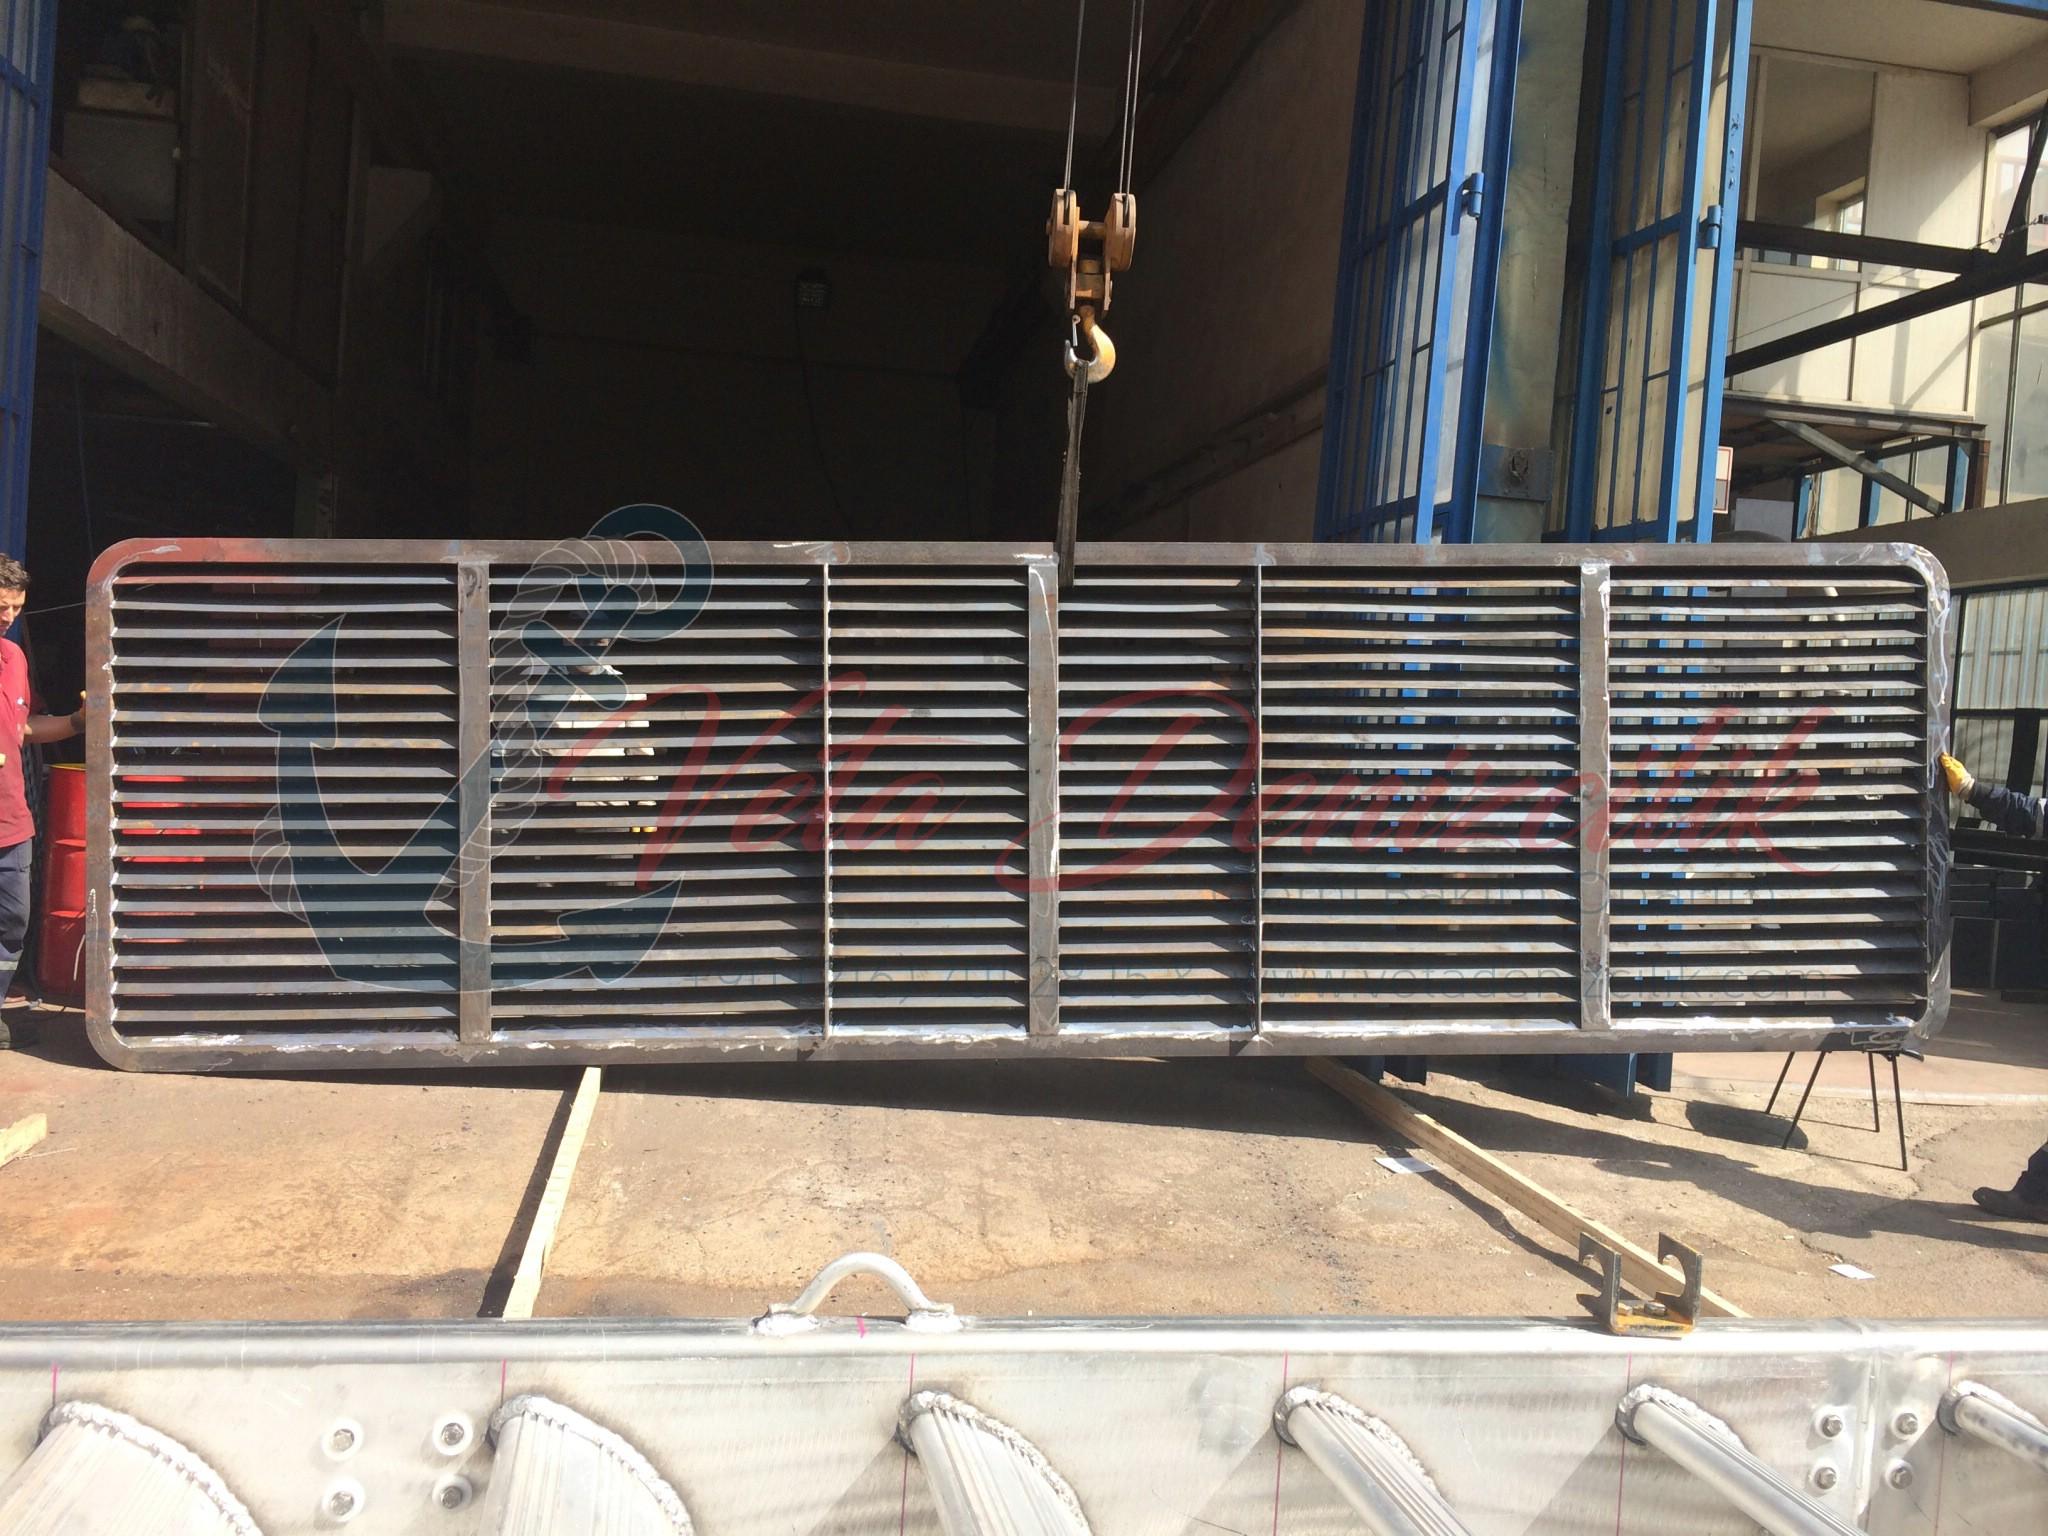 kapakli-hareketli-panjur-automatic-ventilation-shutters-3.jpg